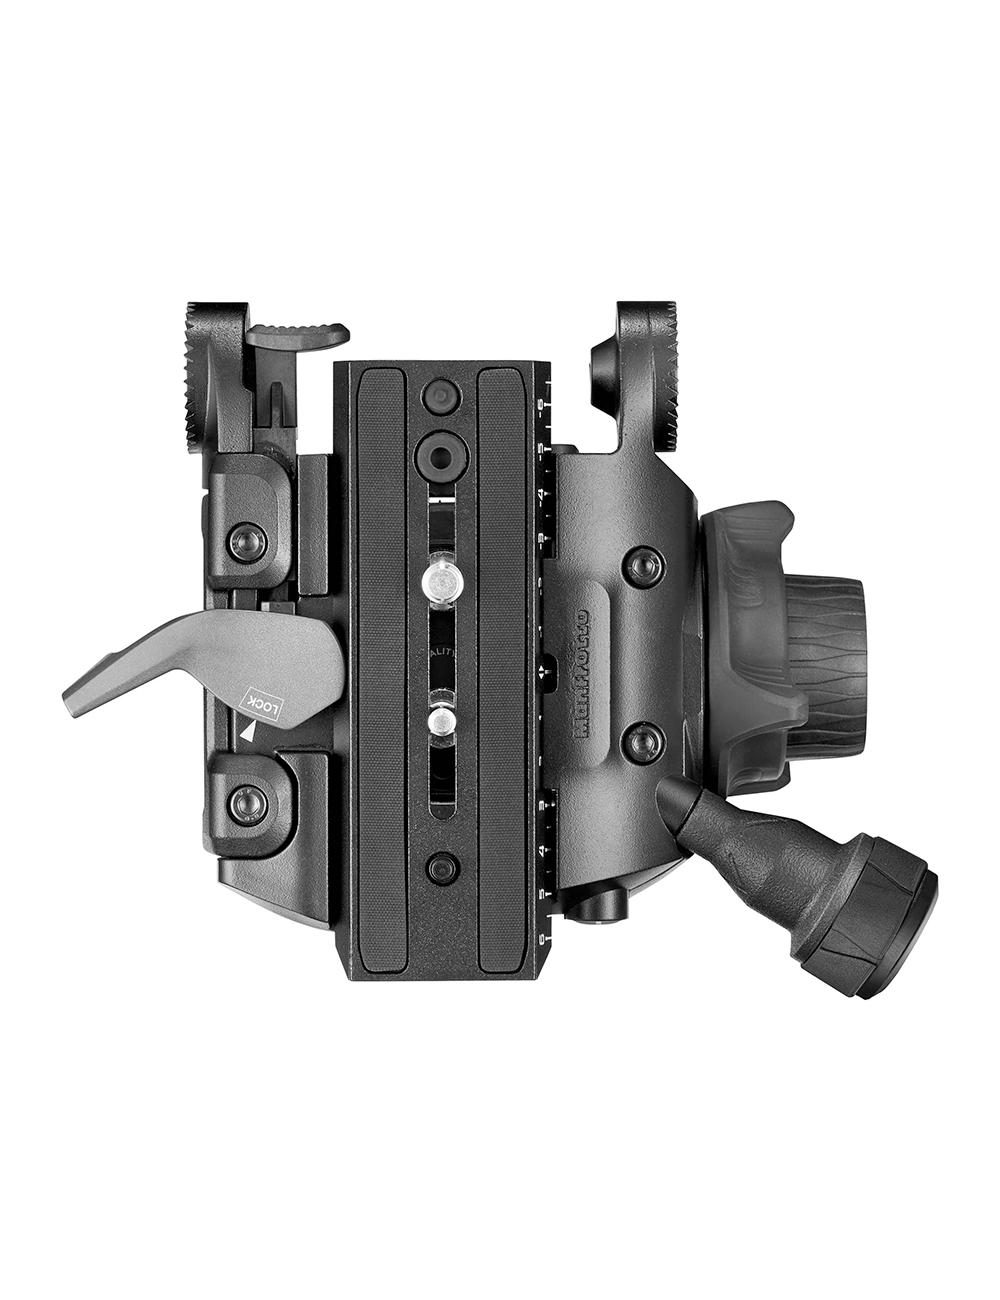 Cabezal Mvh500ah Para Video Fluido Manfrotto